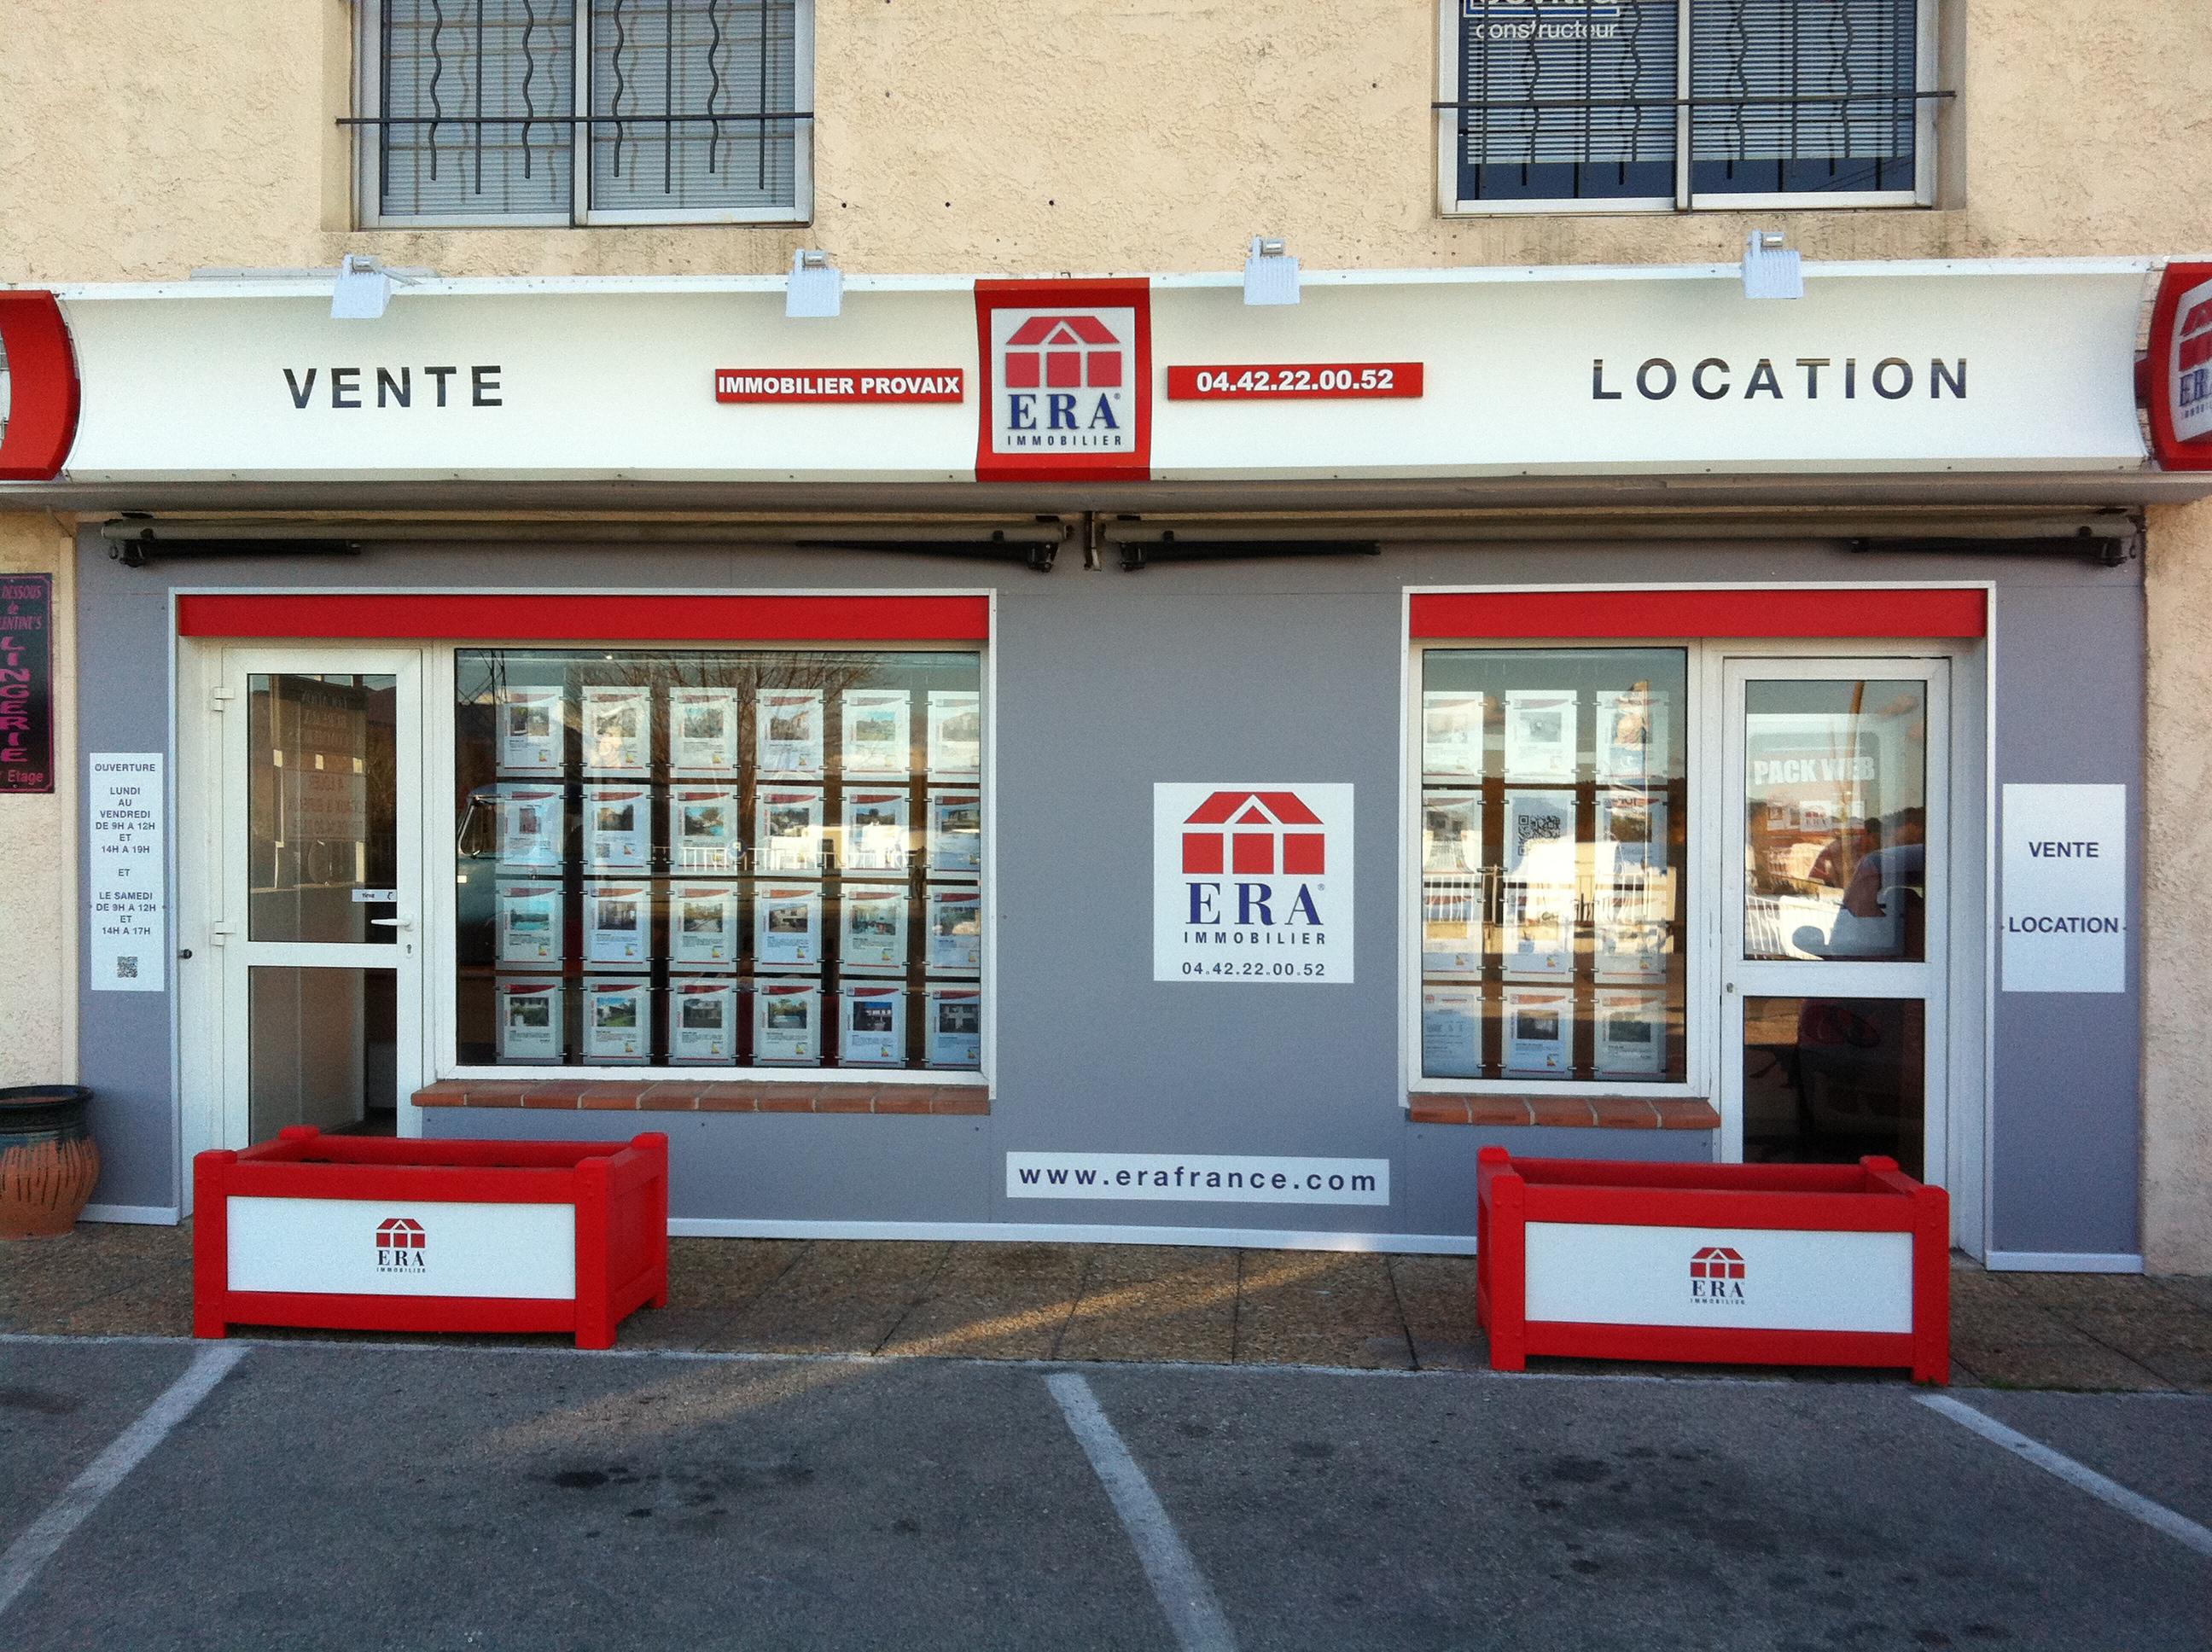 Amenager Son Agence Immobiliere Pour Attirer Les Clients